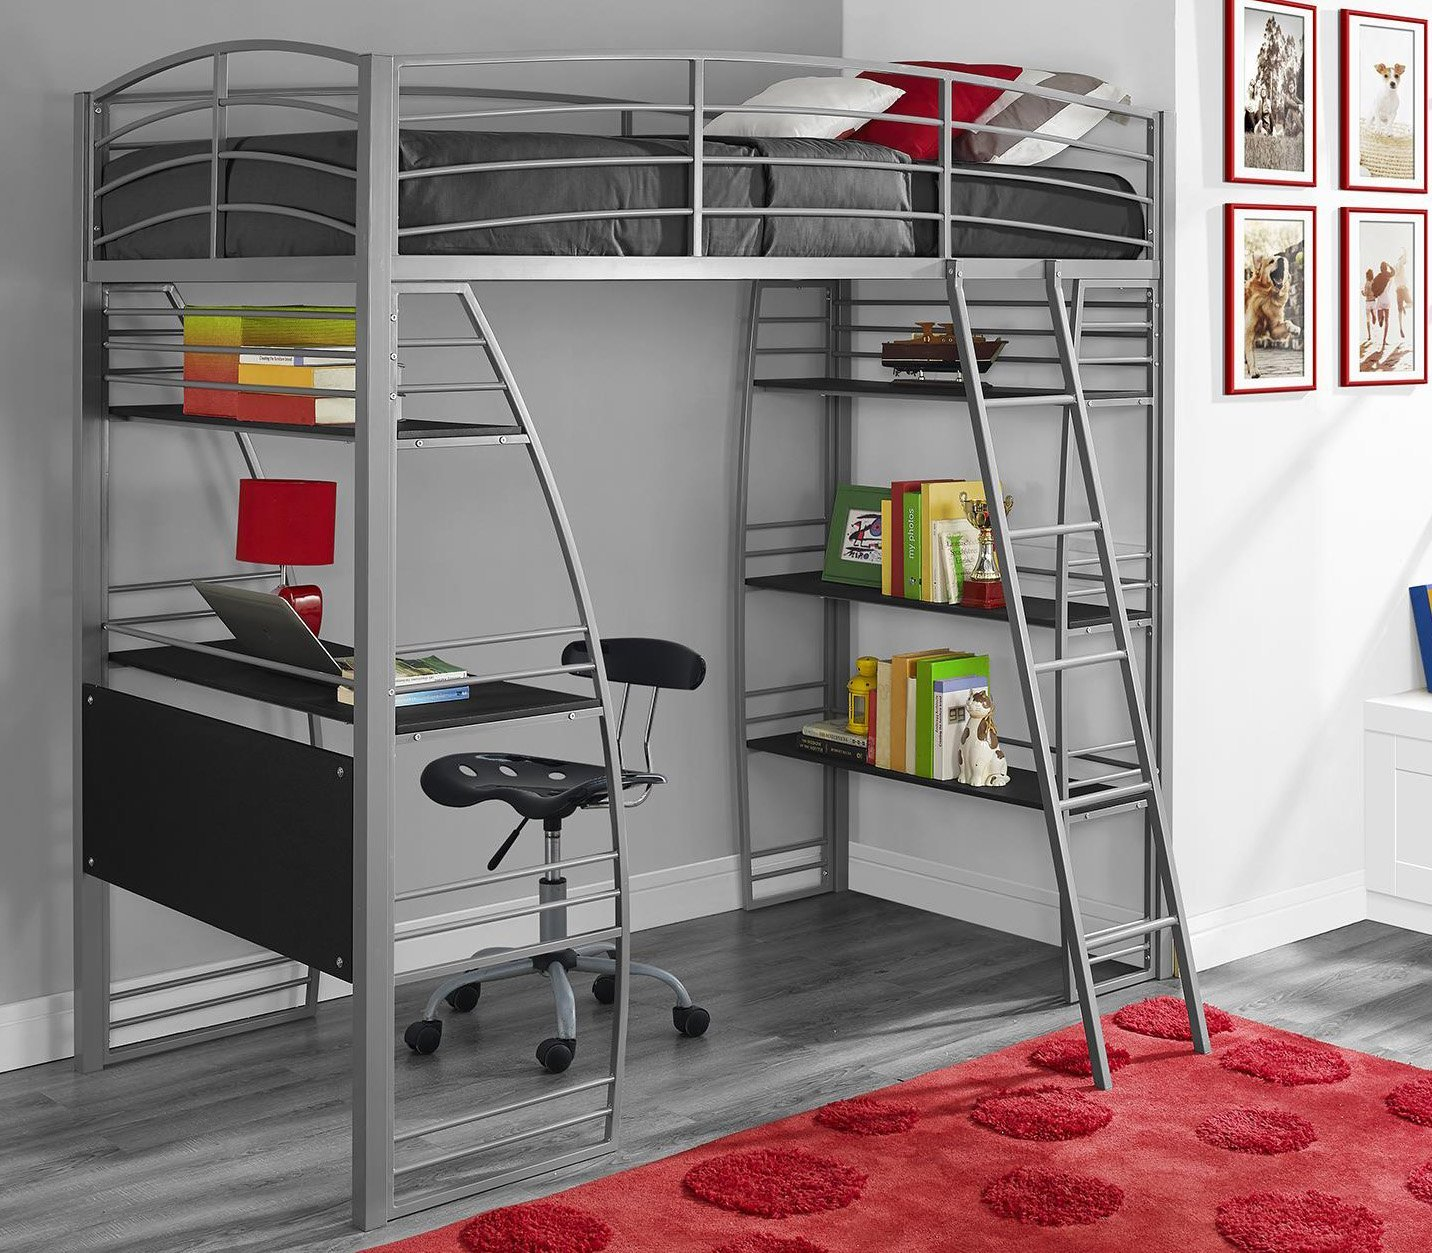 Metal Twin Loft Bed For Kids With Workstation Desk Underneath